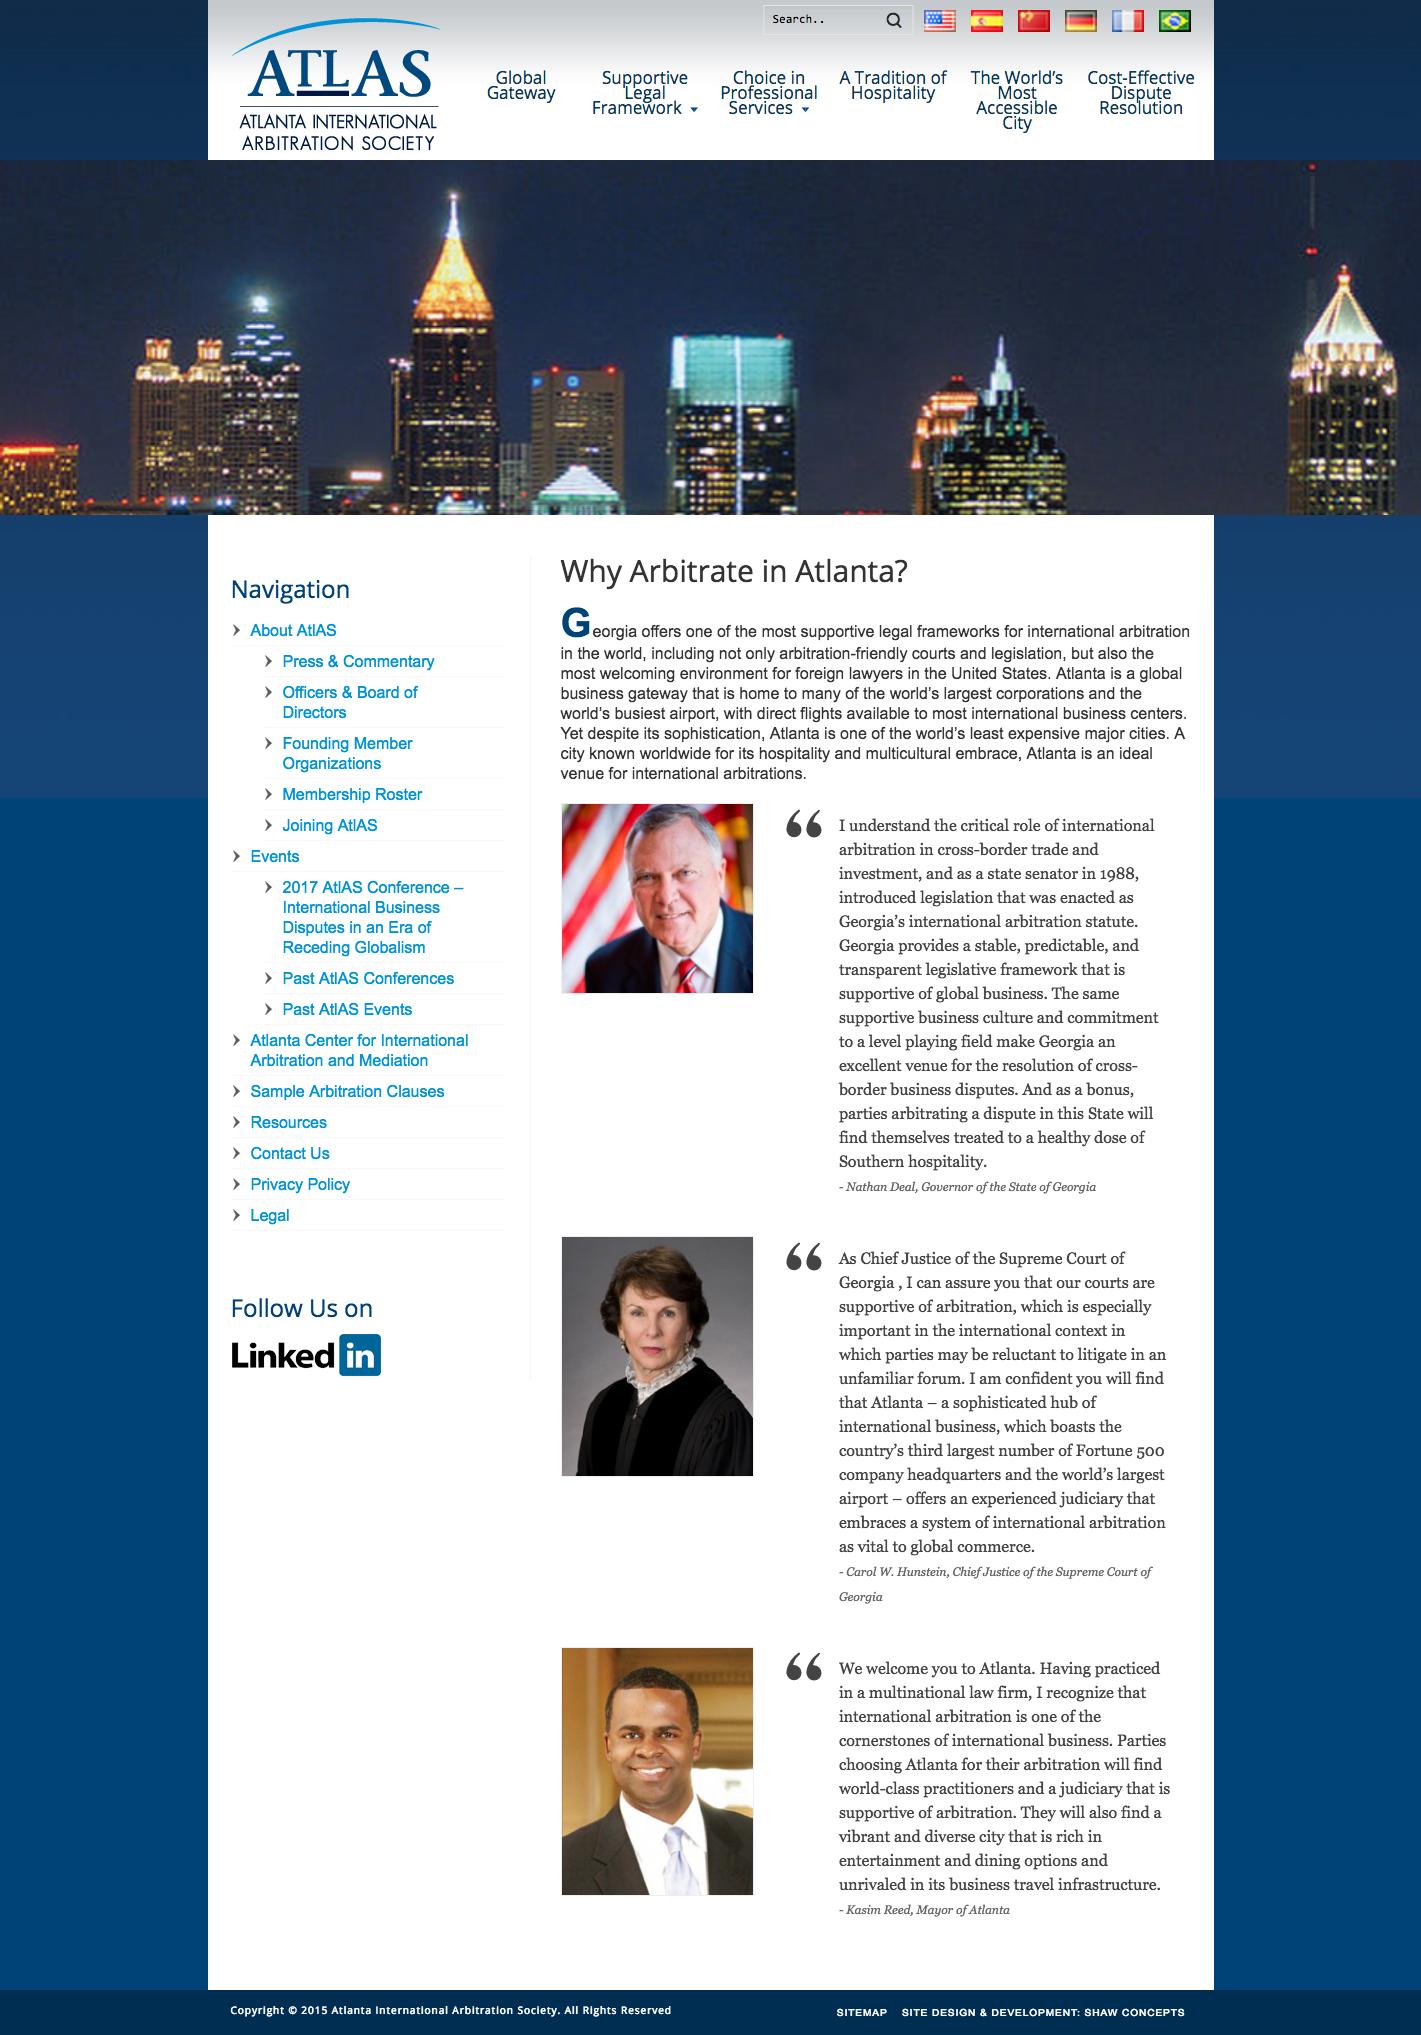 Atlanta_International_Arbitration_Society_full